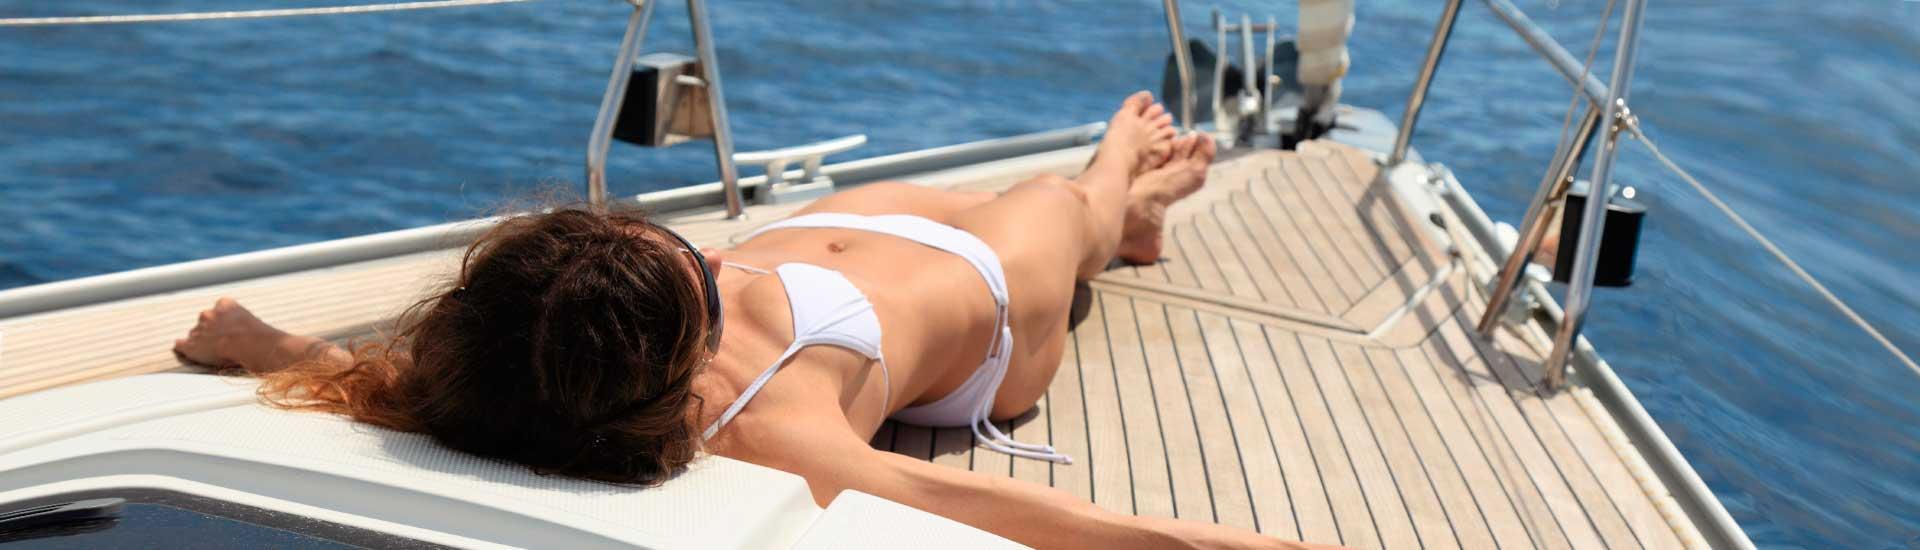 Rilassatevi e godetevi la vela